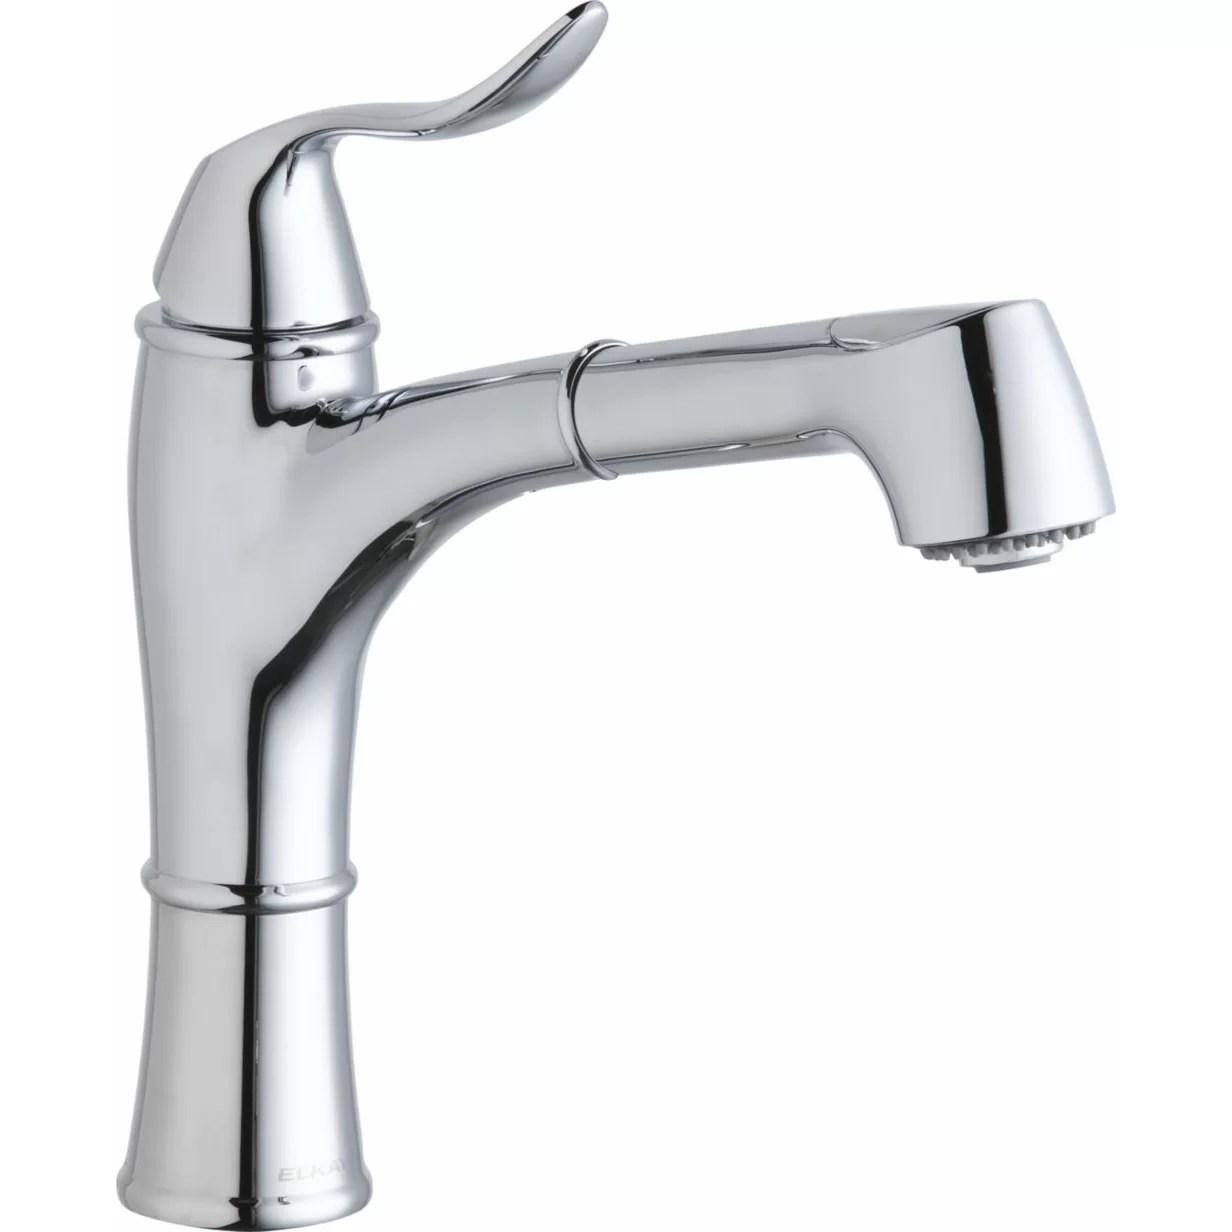 Elkay Explore Single Handle Deck Mount Kitchen Faucet With